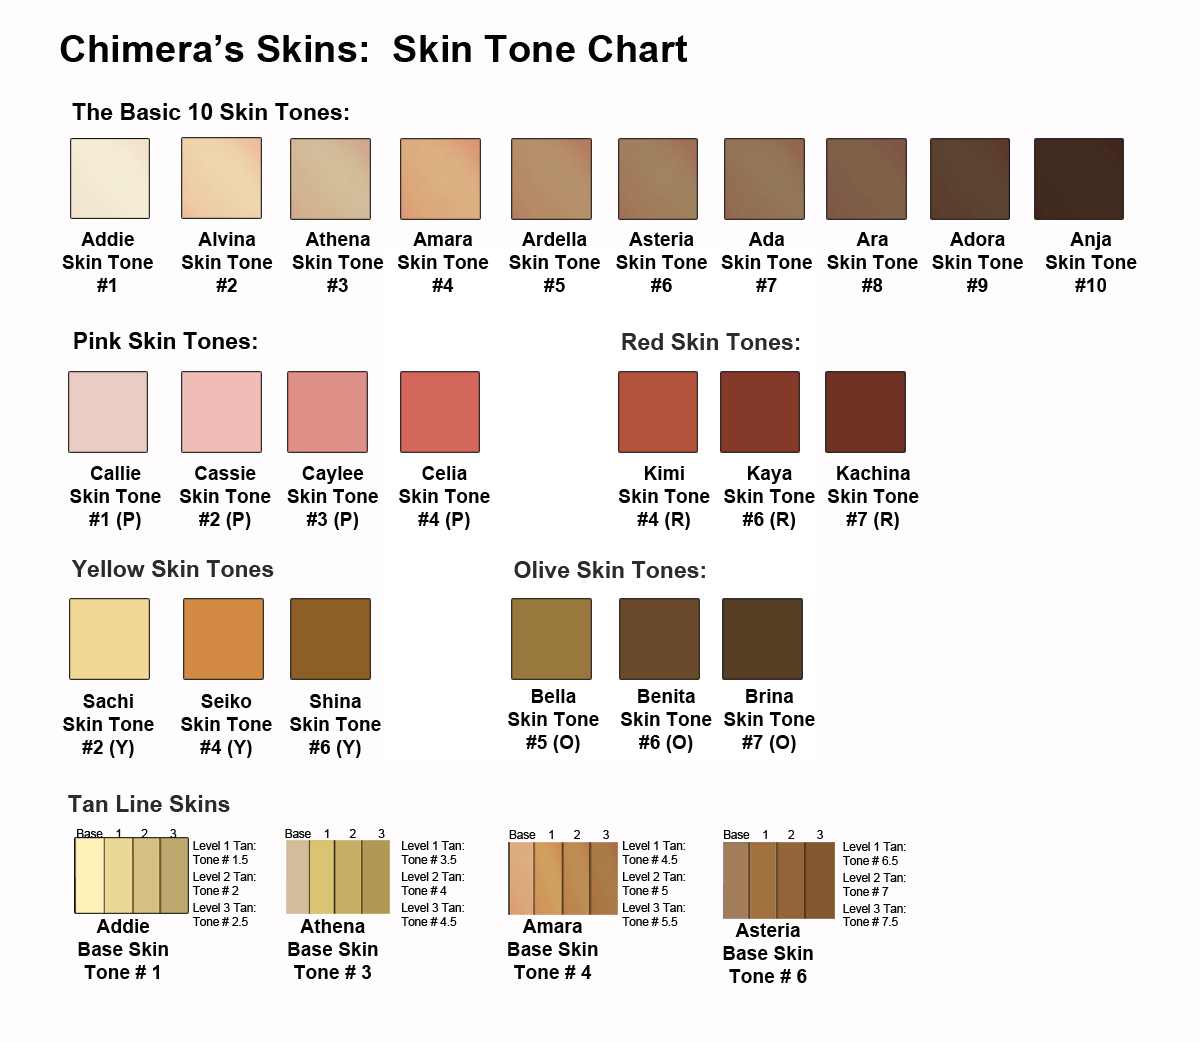 Skin Tone Color Chart